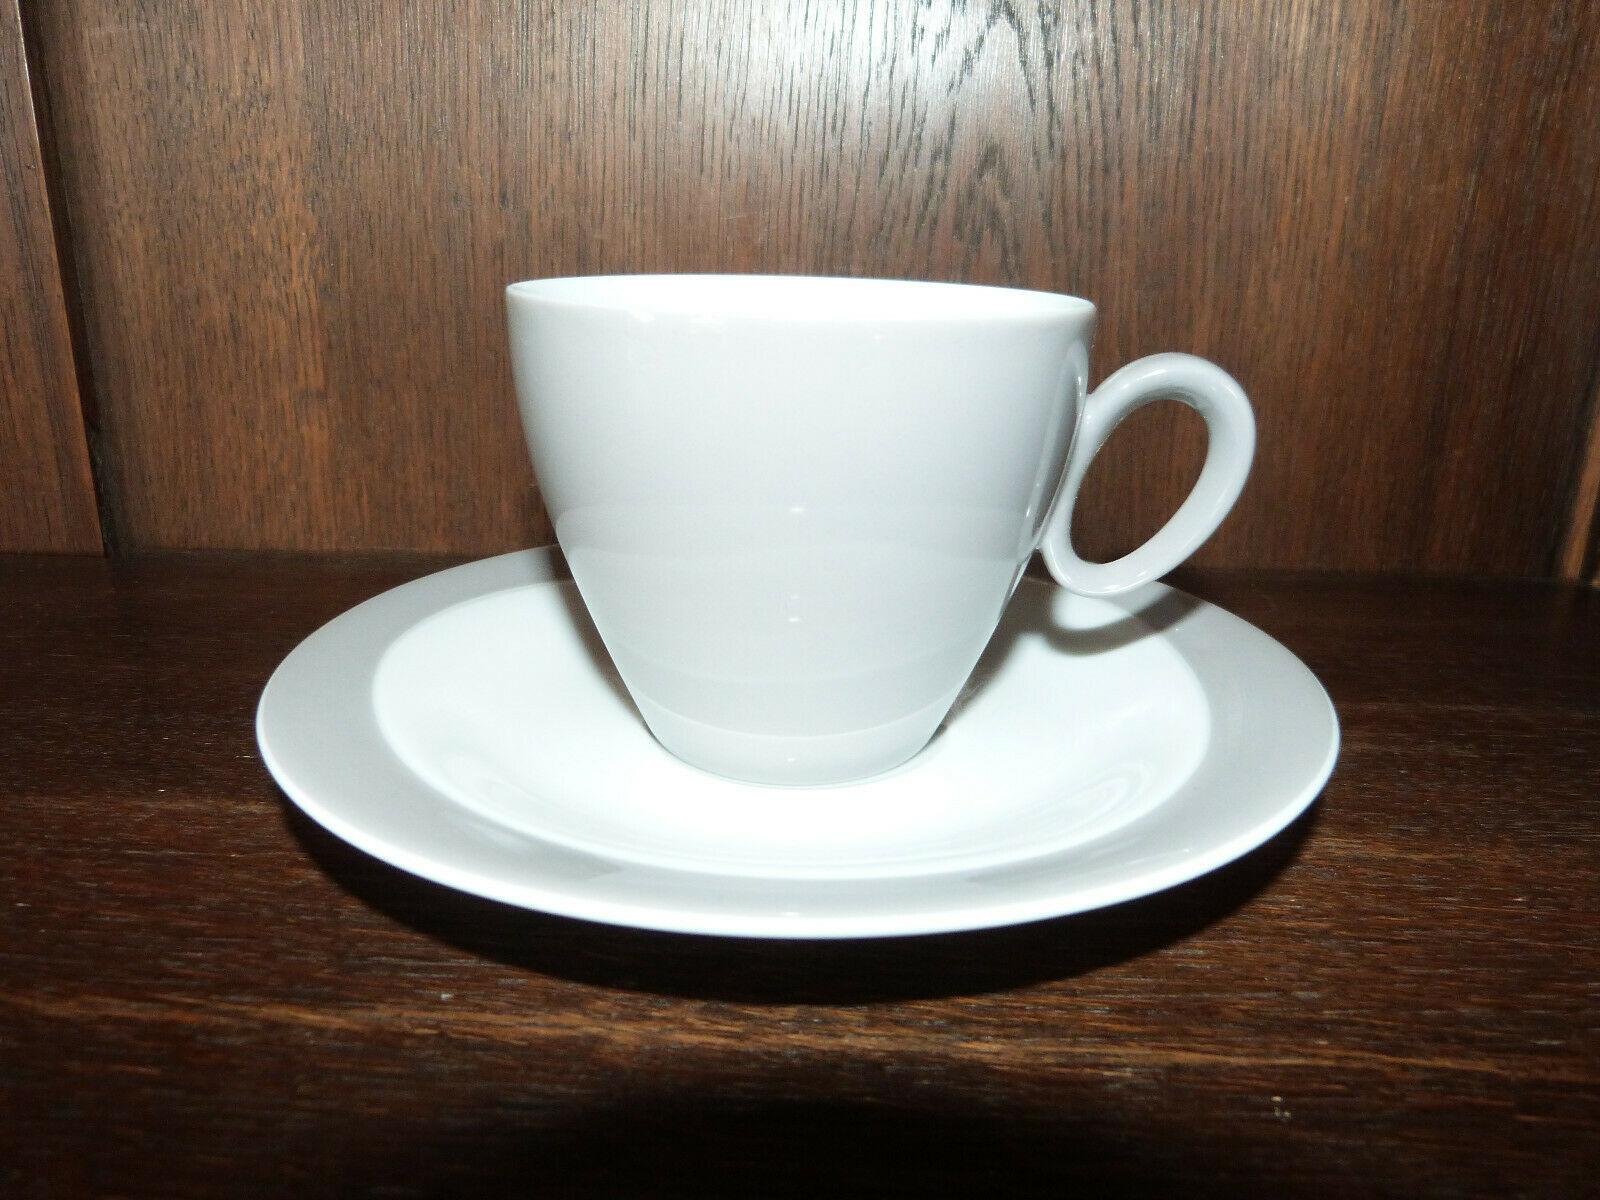 6 tazze caffè 2tlg. Trio springcolores grigio pietra di SELTMANN WEIDEN